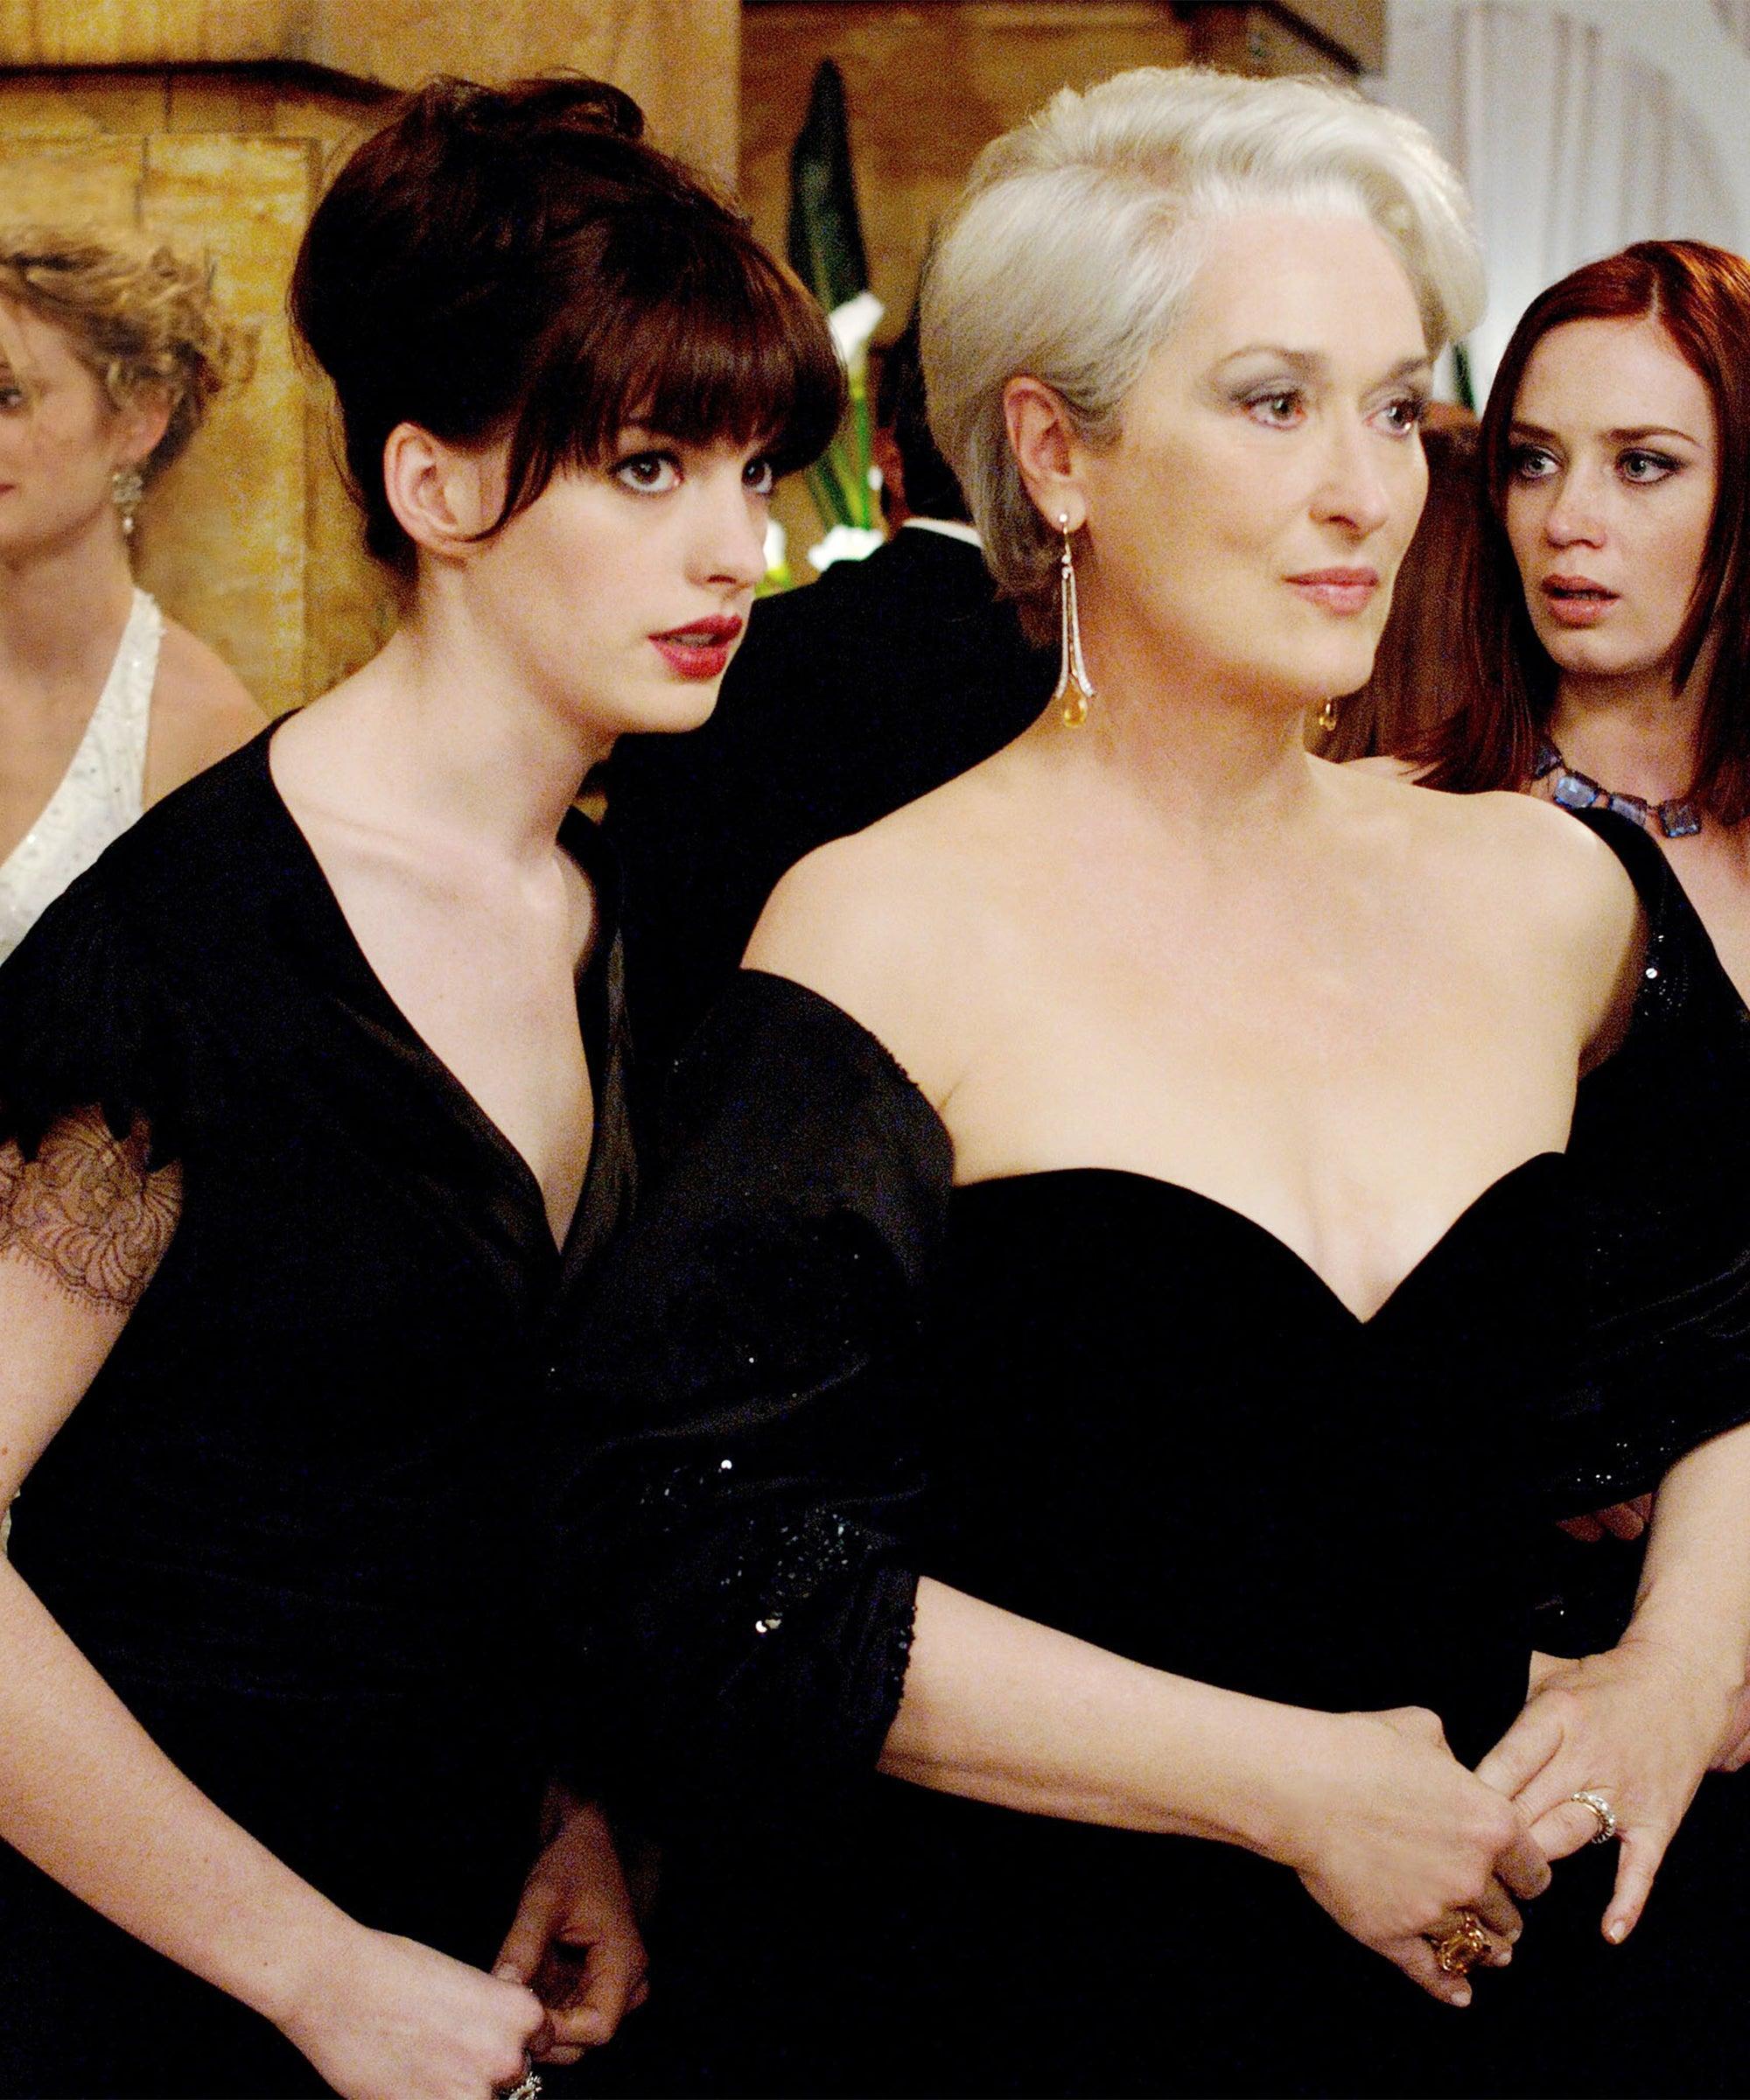 Devil Wears Prada Is Coming Back (Without Meryl Streep & Anne Hathaway)